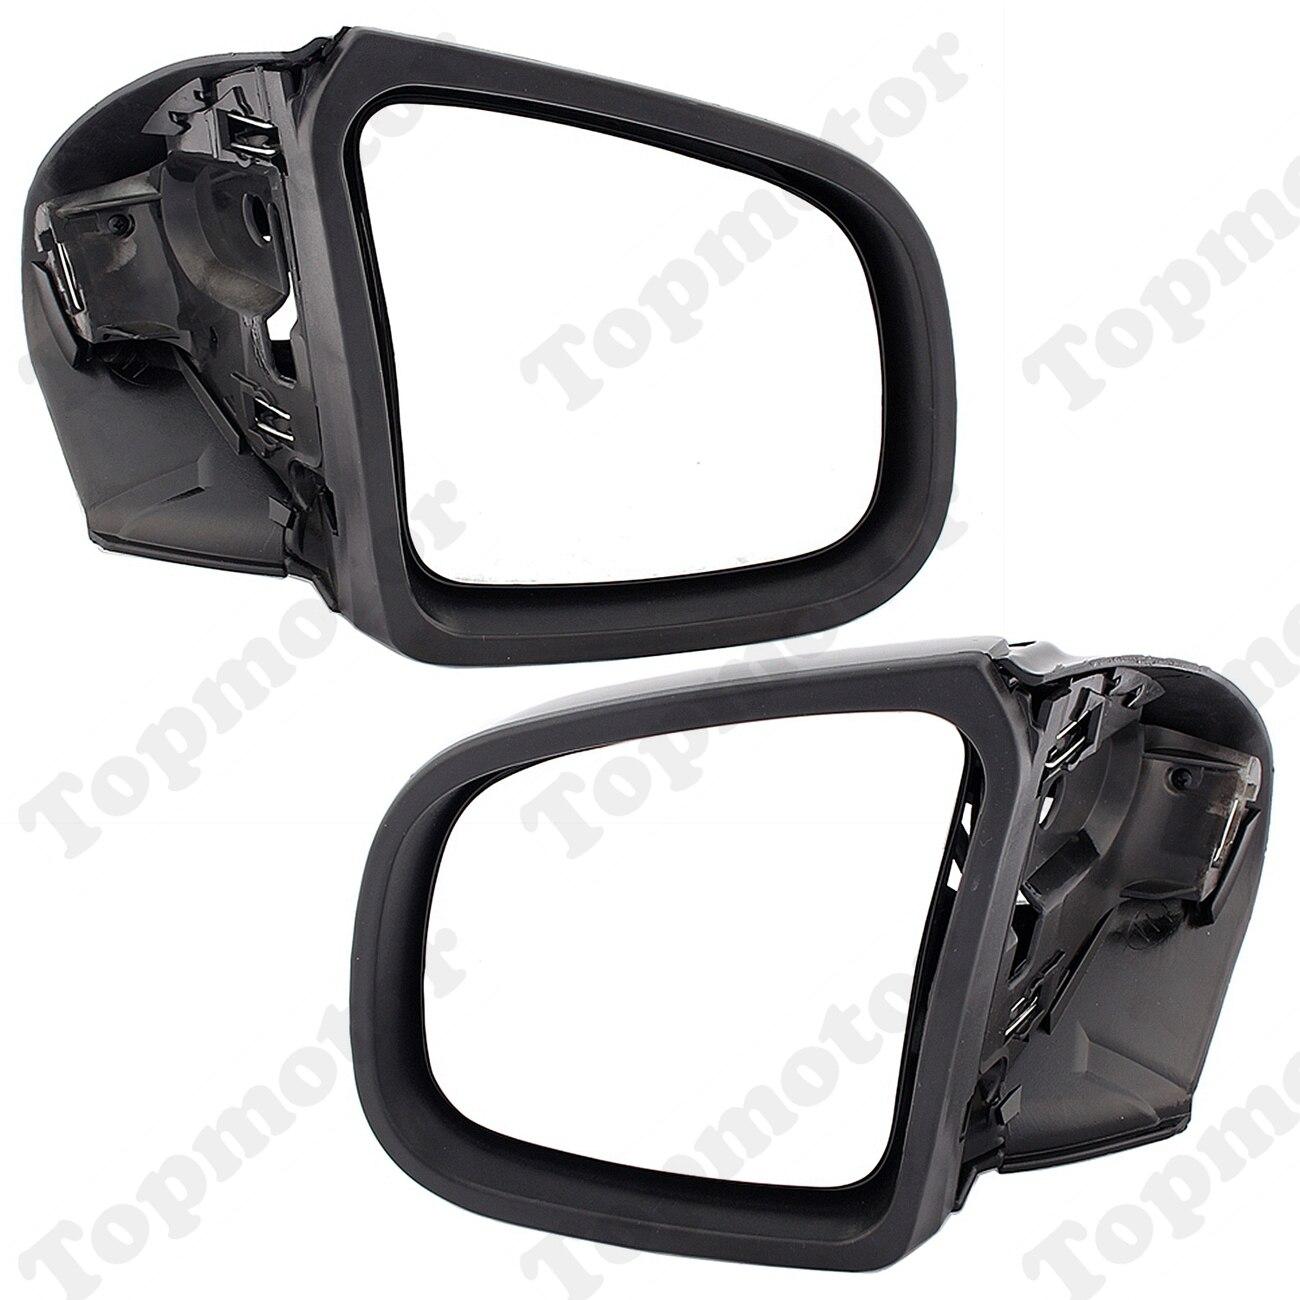 Espejos retrovisores laterales derecho/izquierdo negro brillante para motocicleta BMW K1200LT K1200 LT K1200M 1999 - 2008 retrovisor Moto